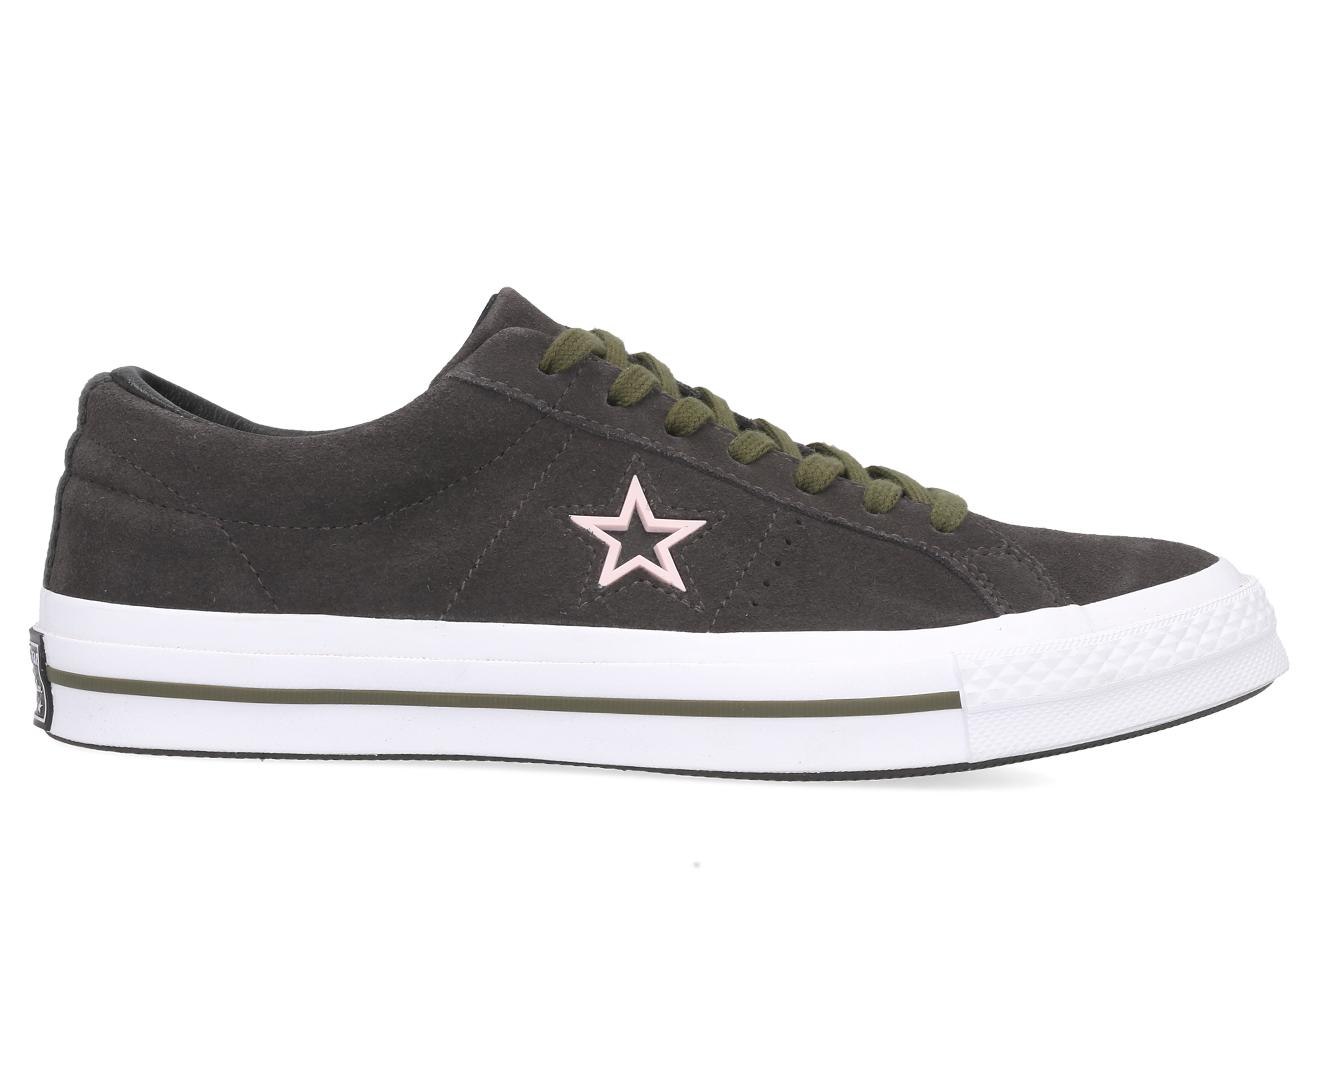 Details about Converse Men's One Star Ox Sneakers Storm WindWhiteBlack